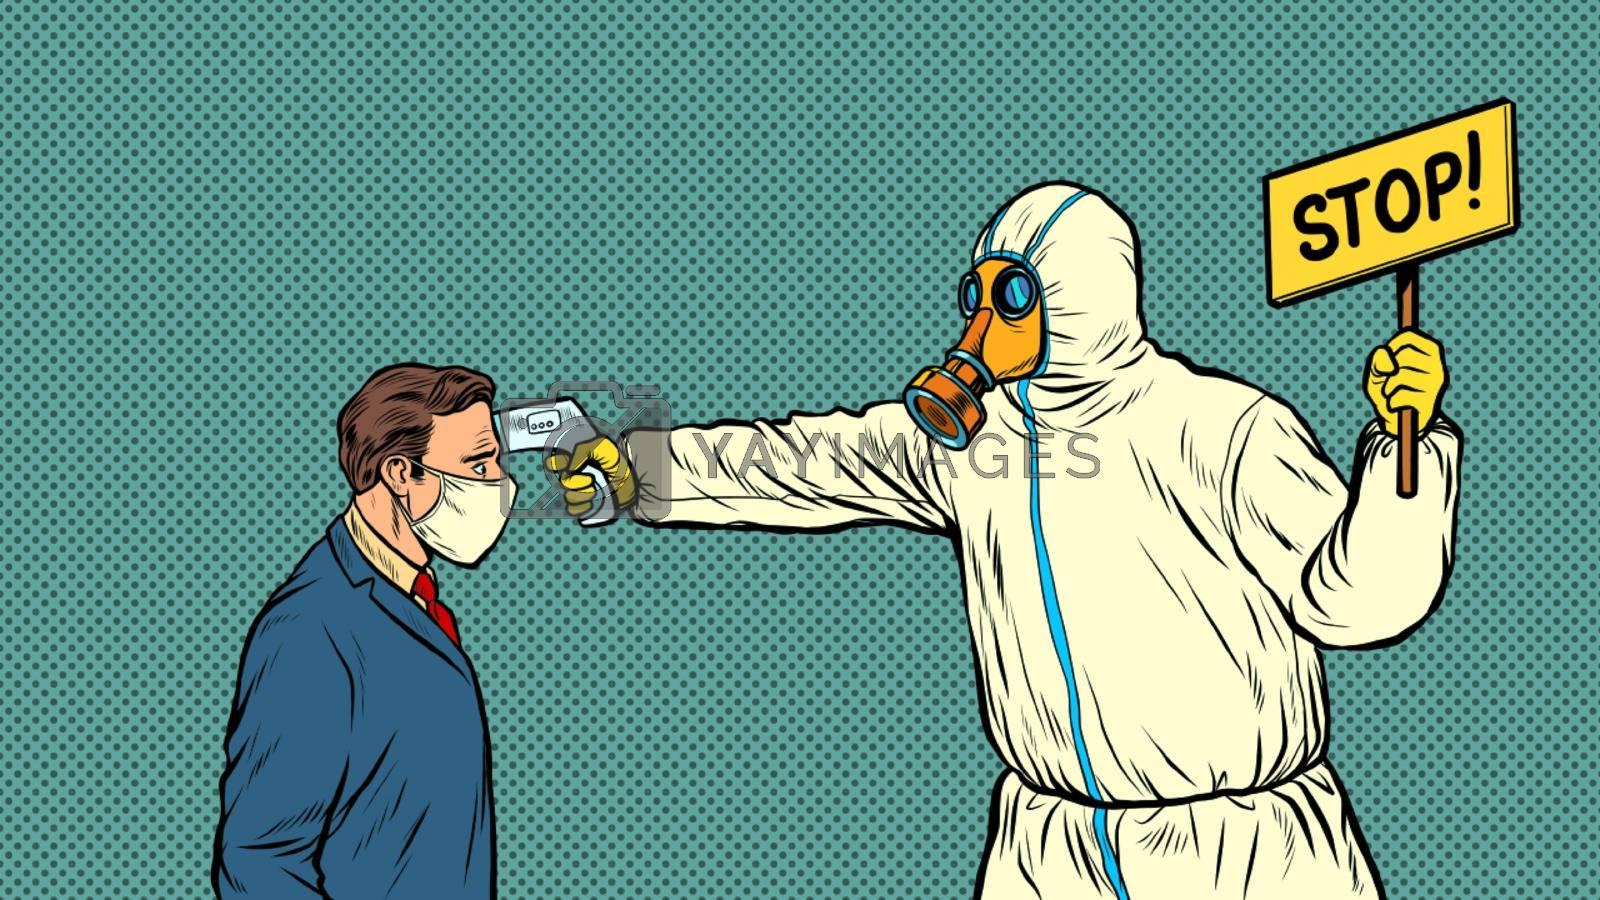 Temperature measurement Stop doctor quarantine. Novel Wuhan coronavirus 2019-nCoV epidemic outbreak. Pop art retro vector illustration 50s 60s style